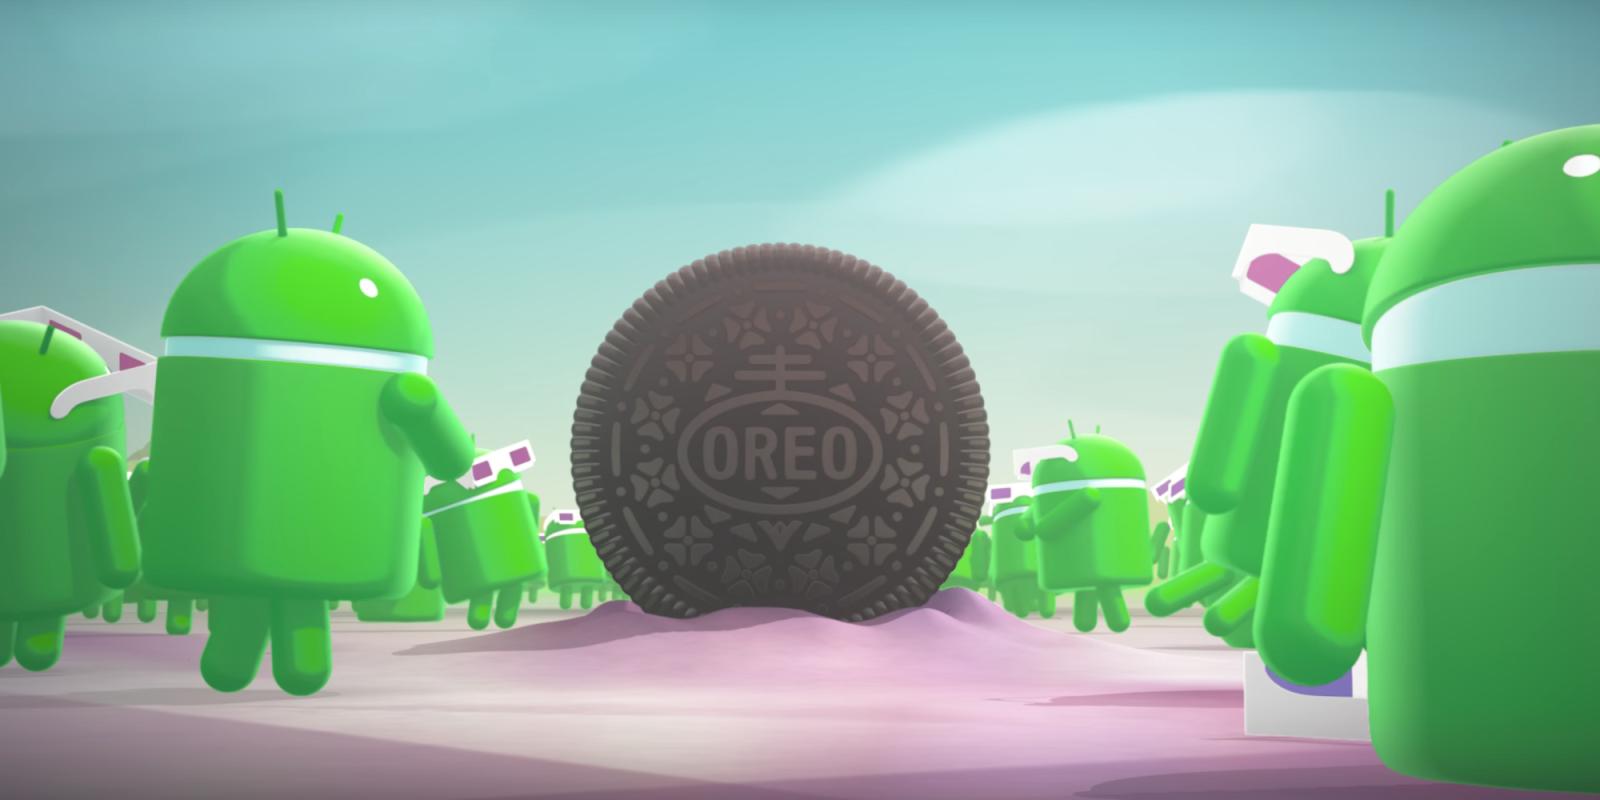 85-android-oreo-open-wonder-youtube-2017-08-21-12-20-09